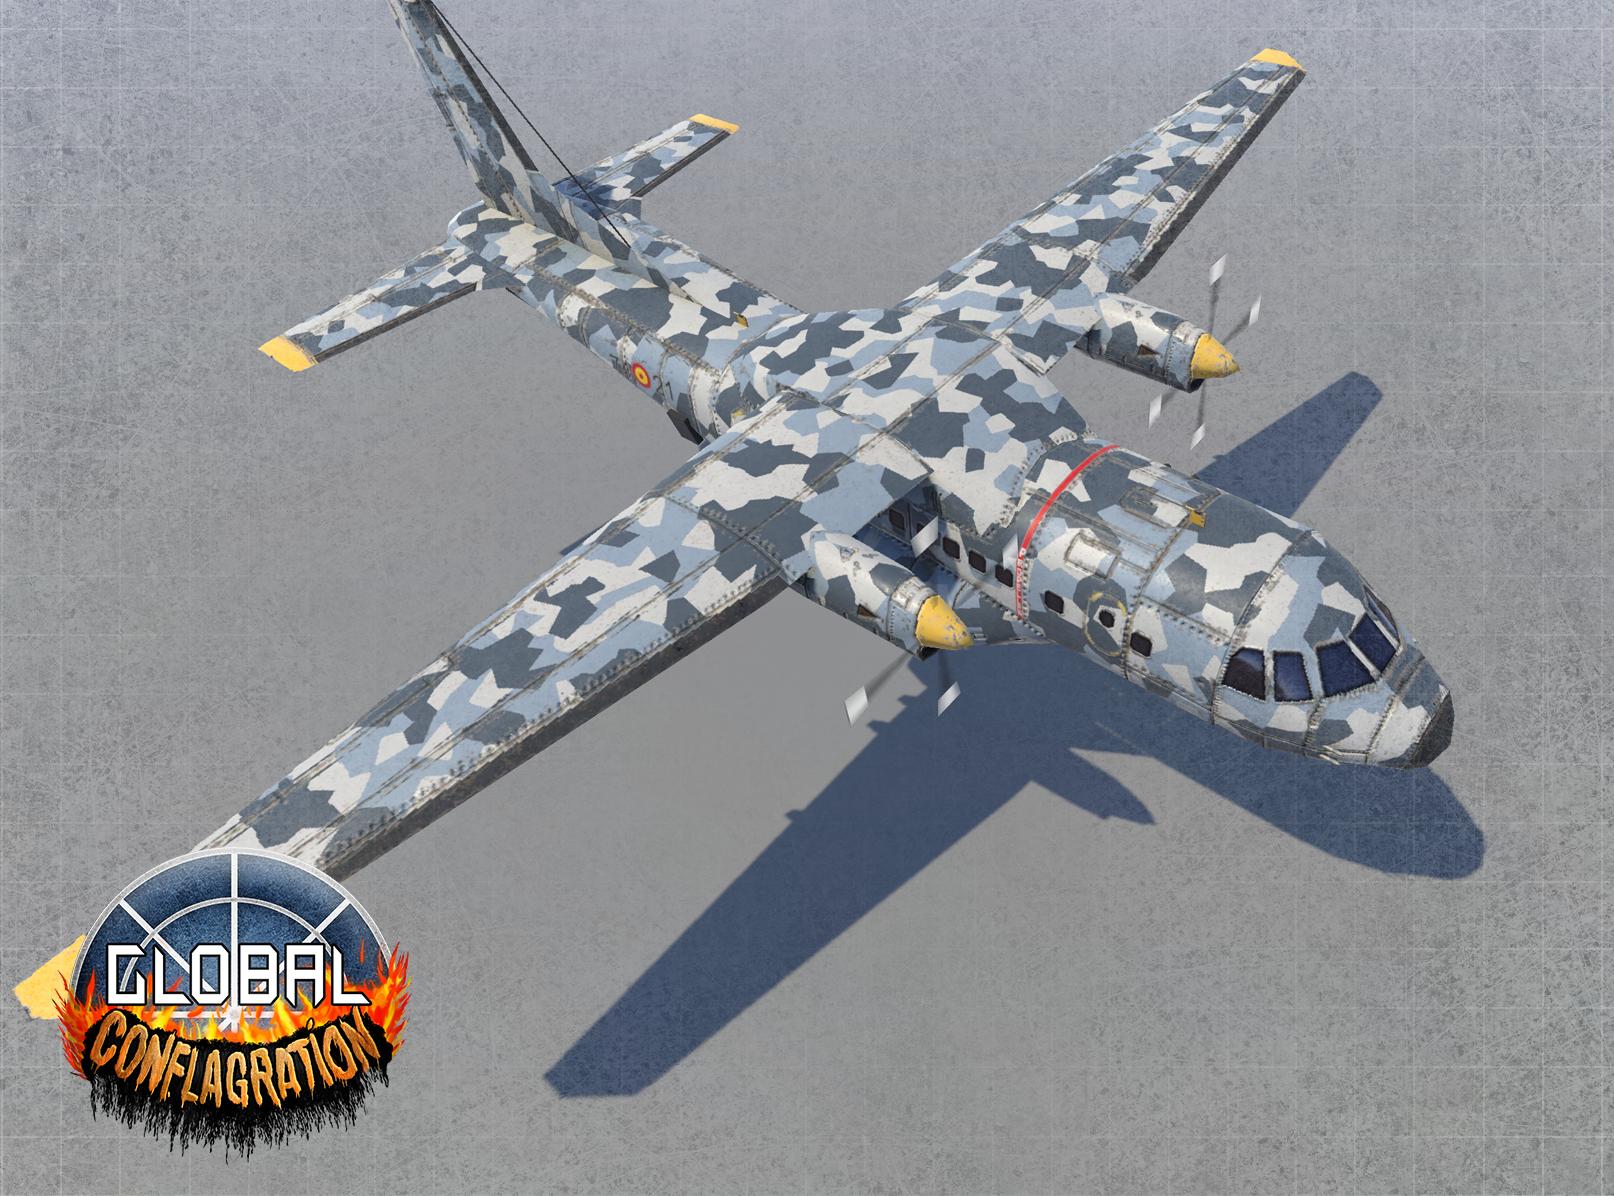 Cn 235 Edu Gunship Remastered Image Global